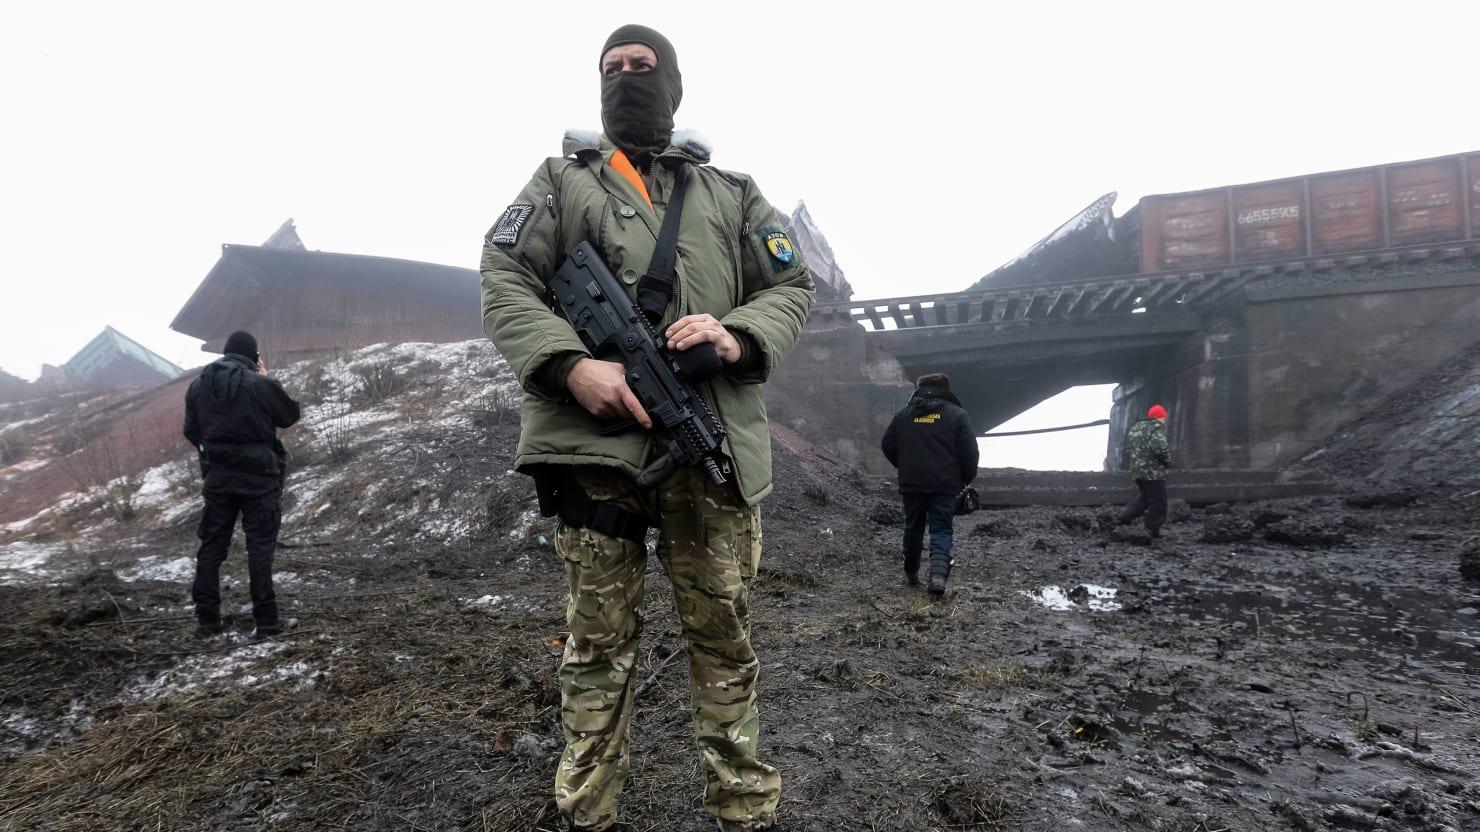 Is This The Next Big Battle of the Ukraine War?